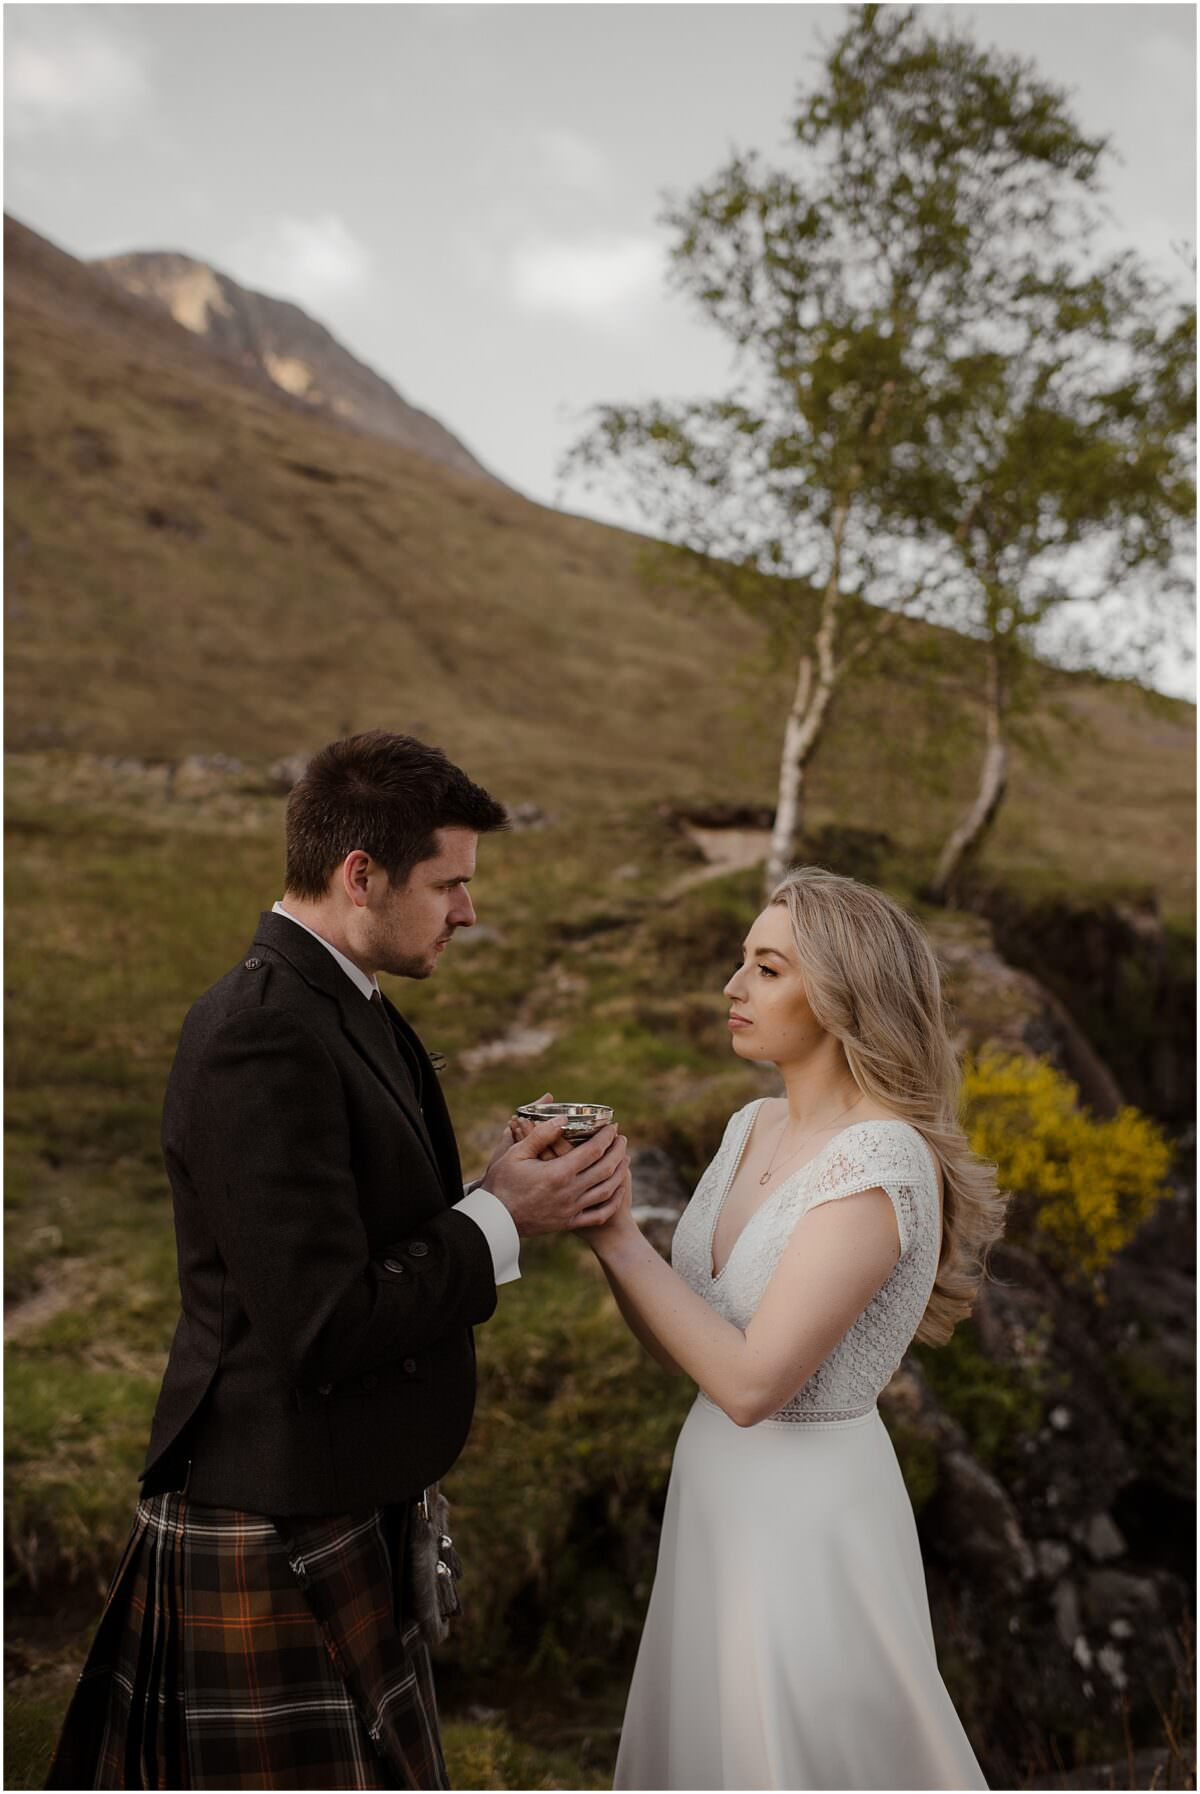 The Quaich ceremony in Scotland - Scotland elopement photographer